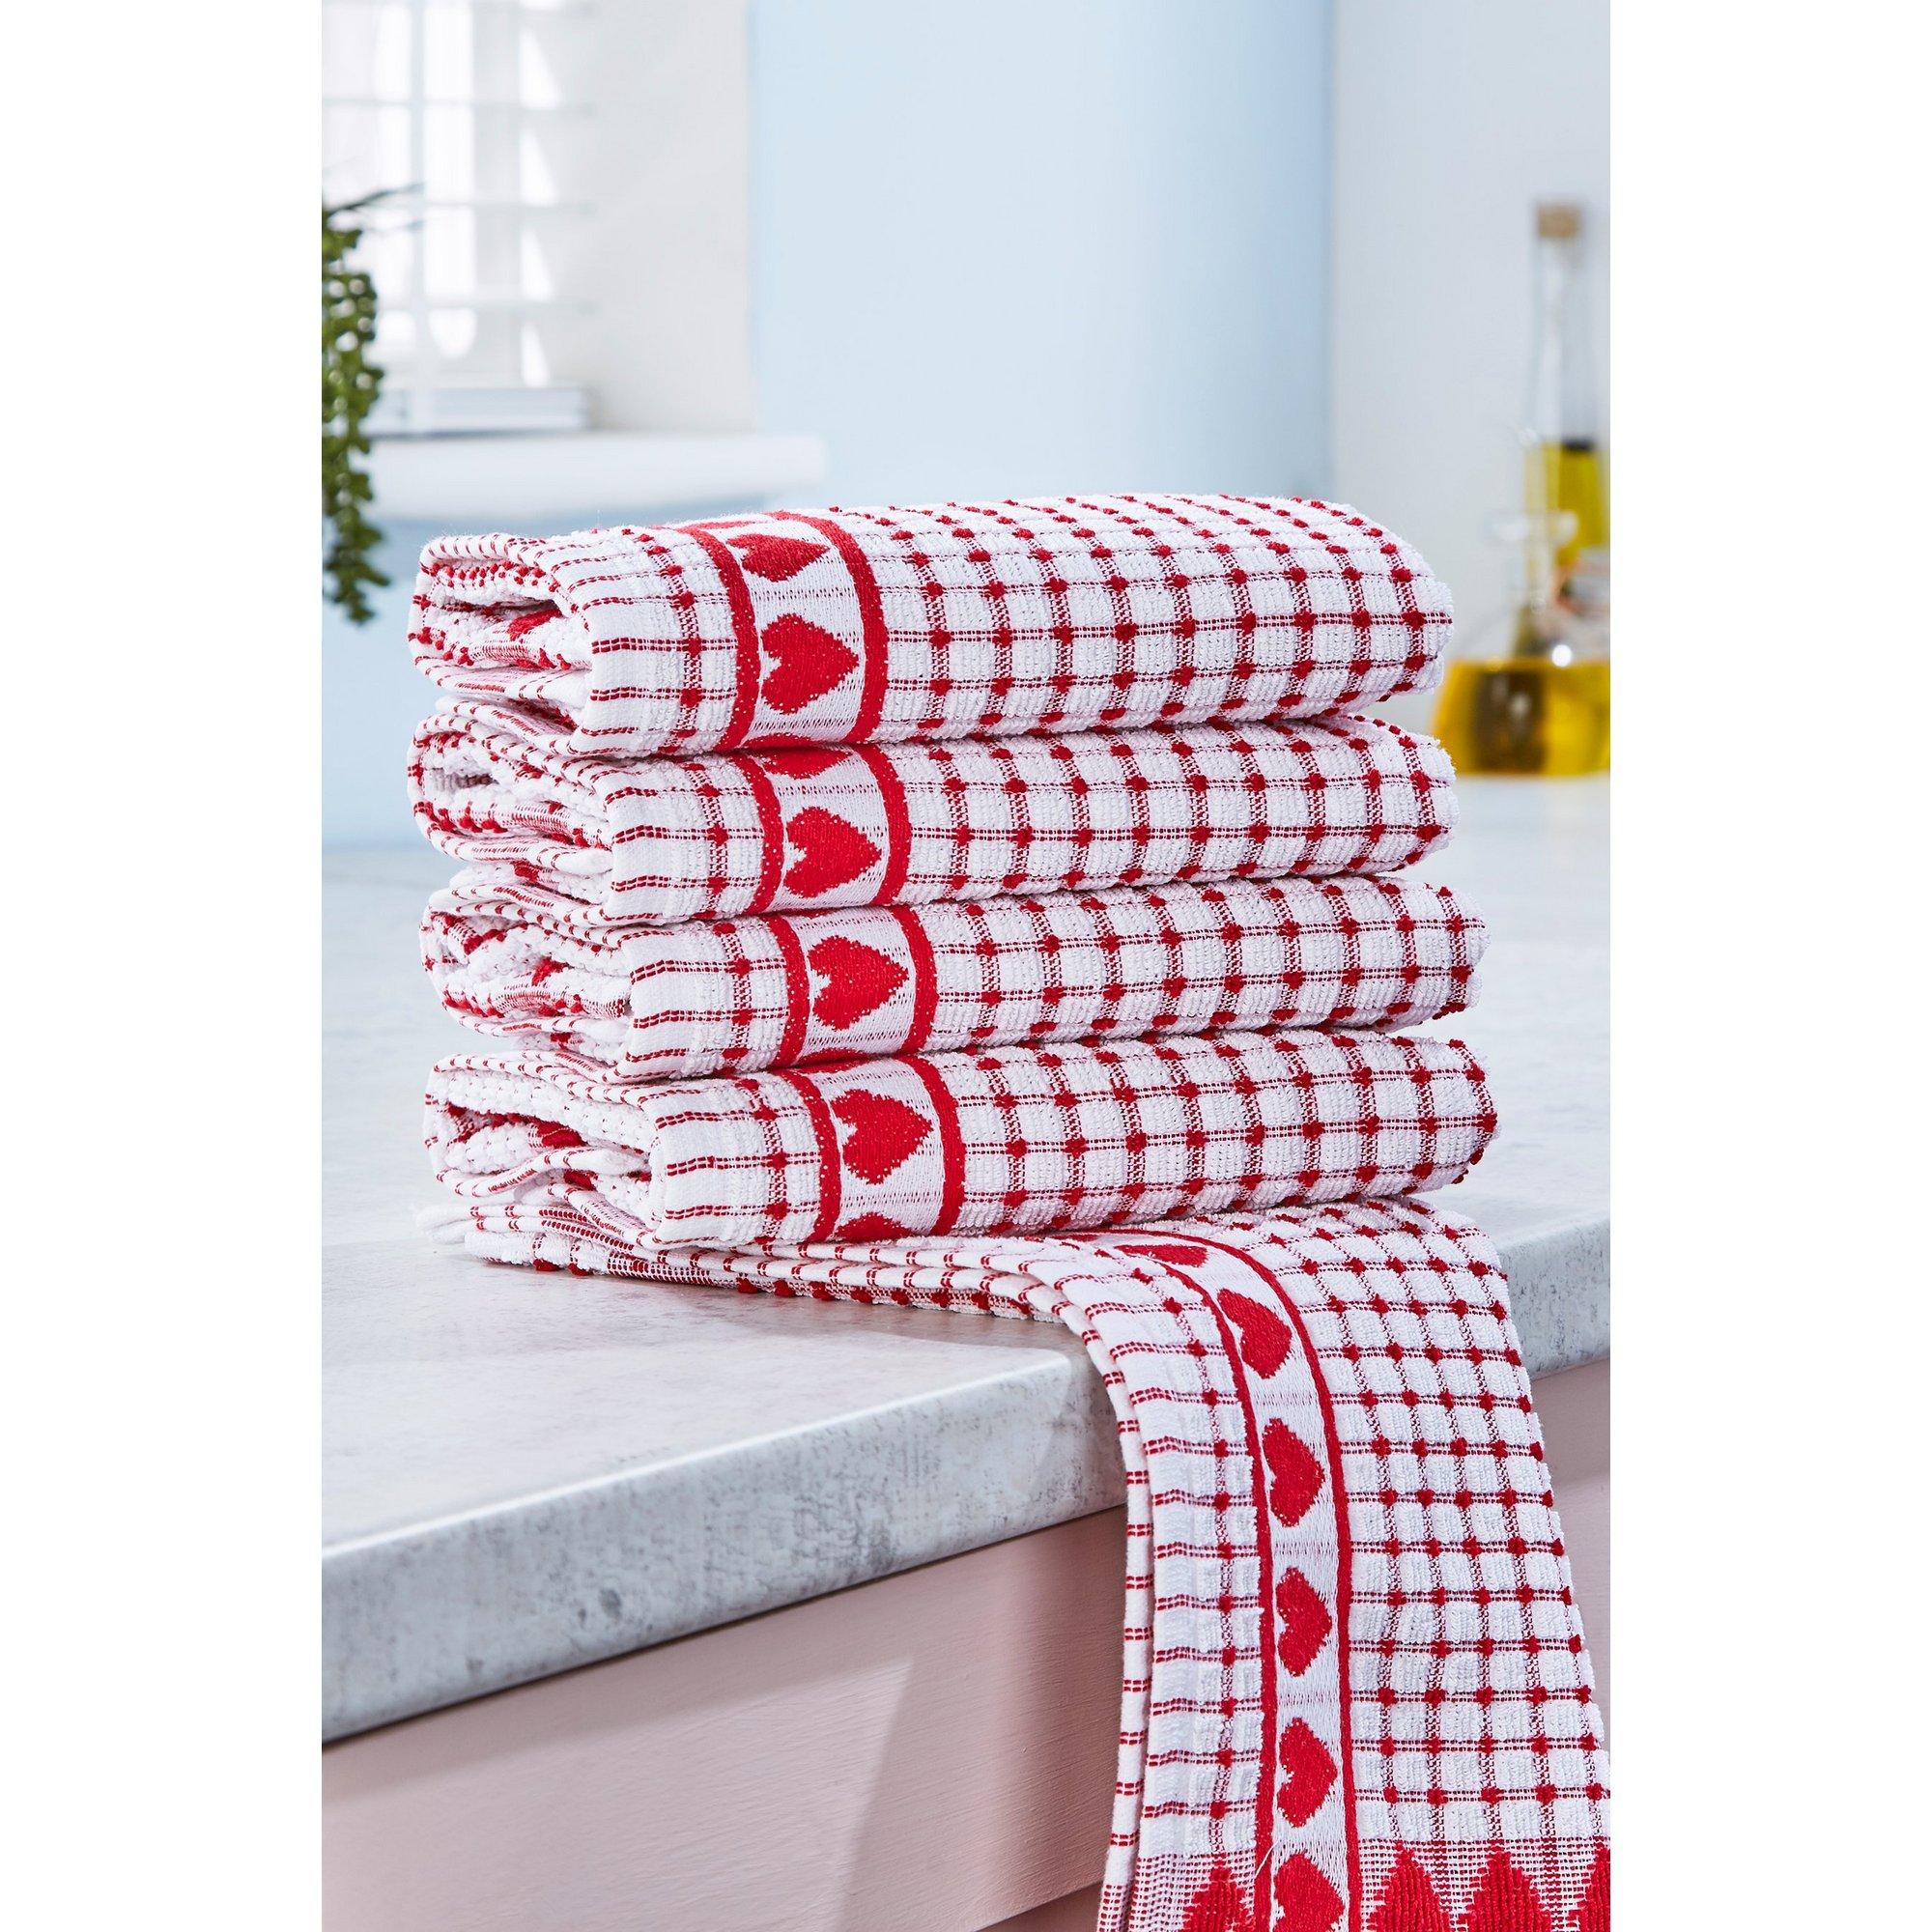 Image of Pack of 5 Heart Design Jacquard Tea Towels